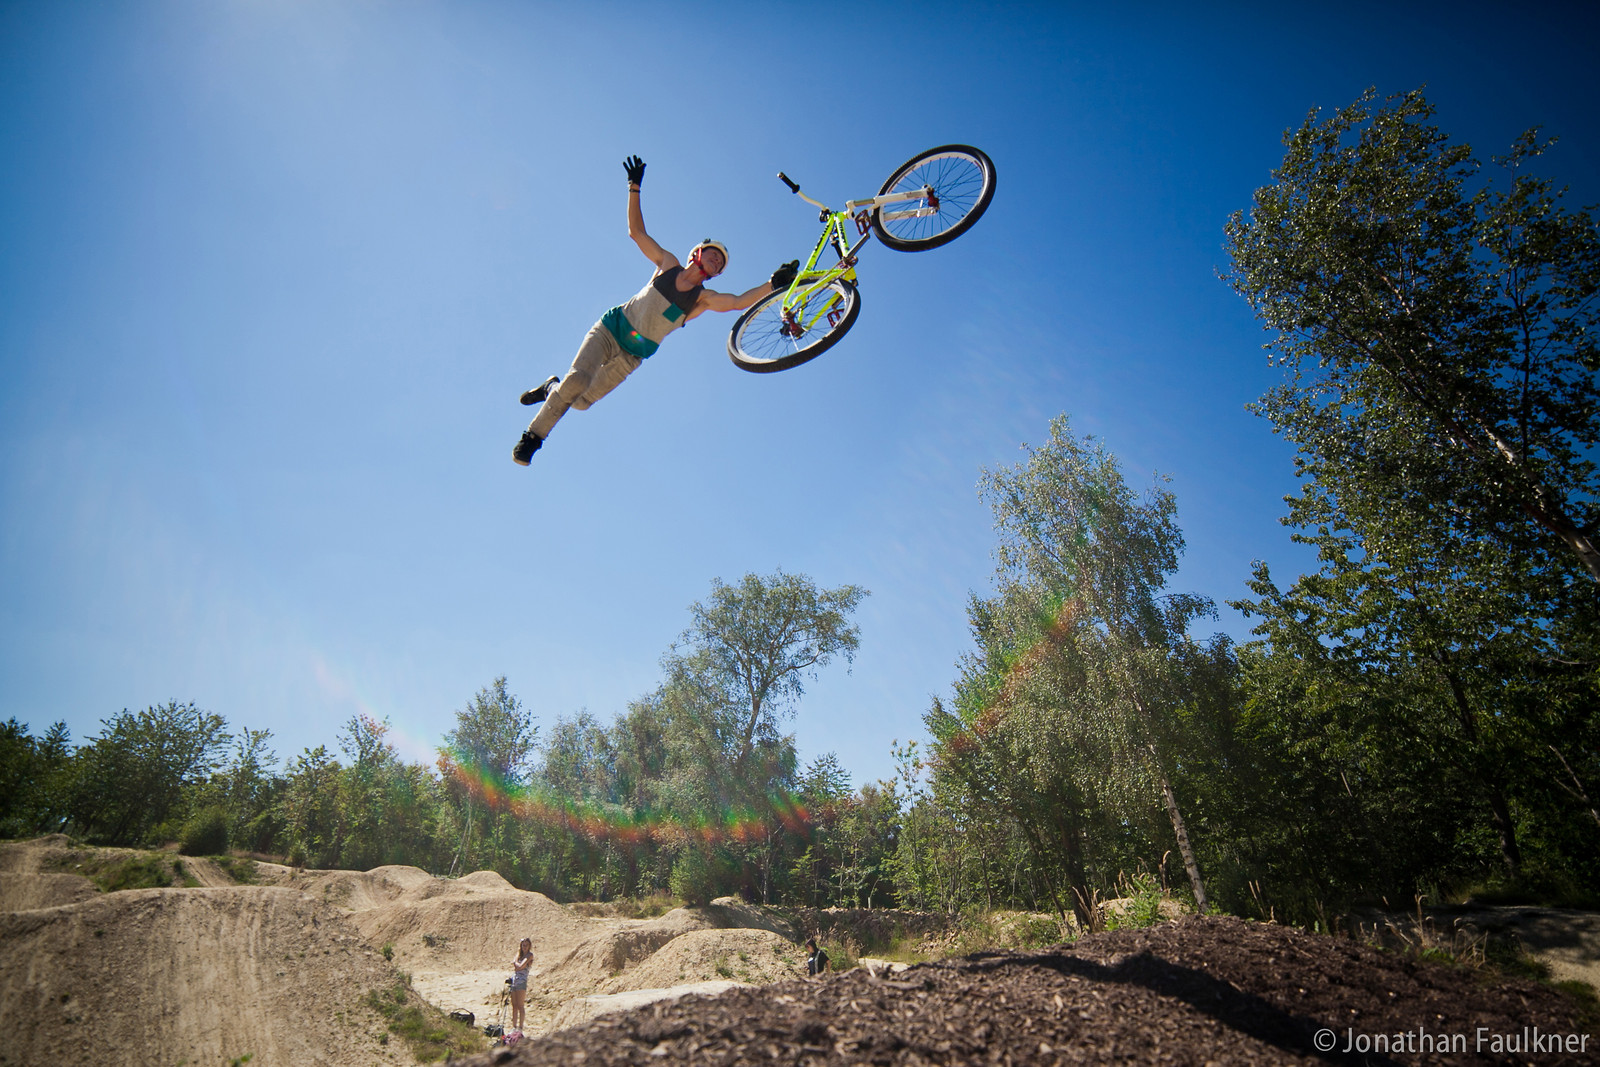 Super seat - Jonny Faulkner - Mountain Biking Pictures - Vital MTB